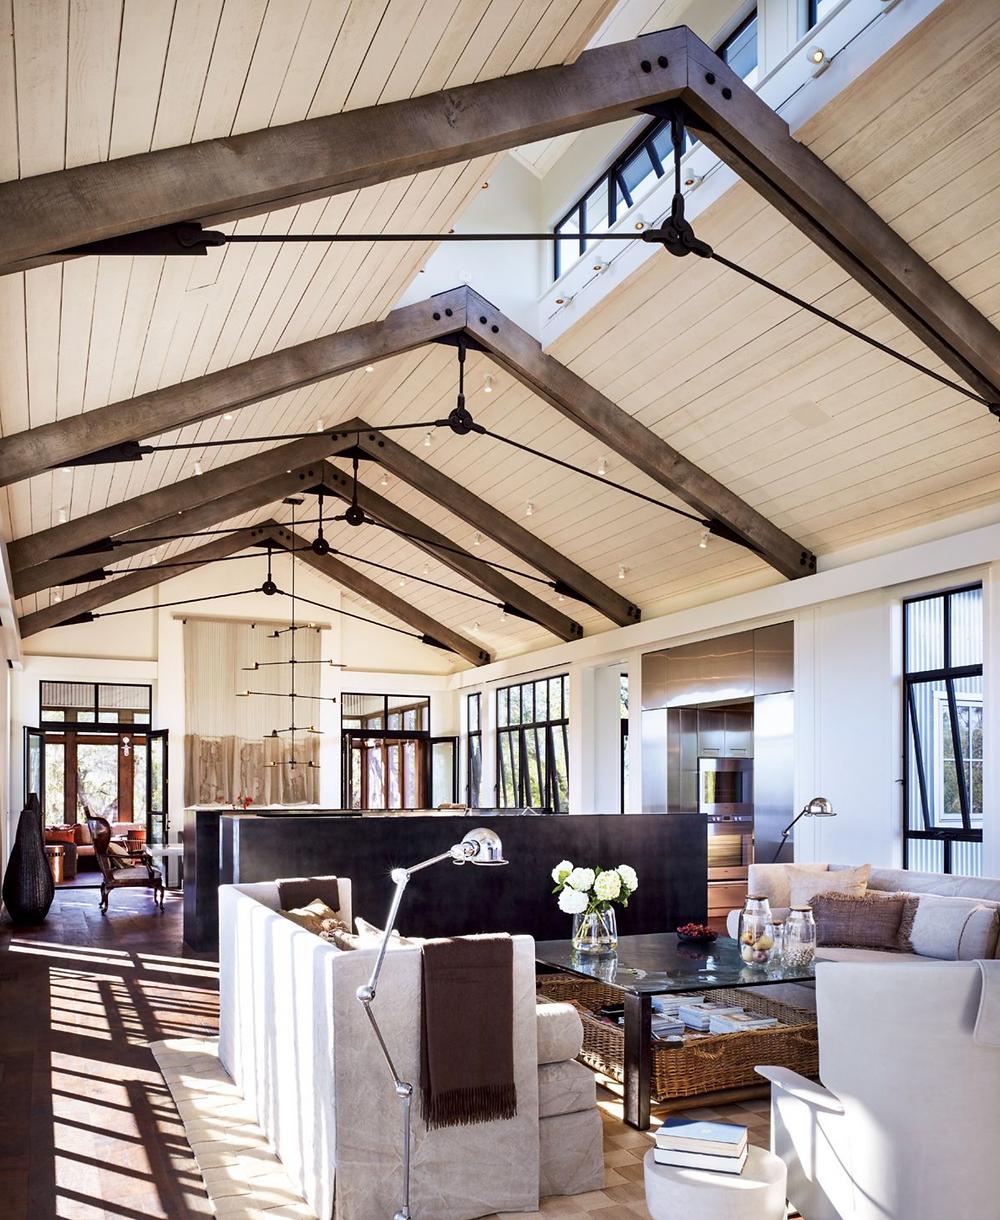 gothic architecture inspired interior